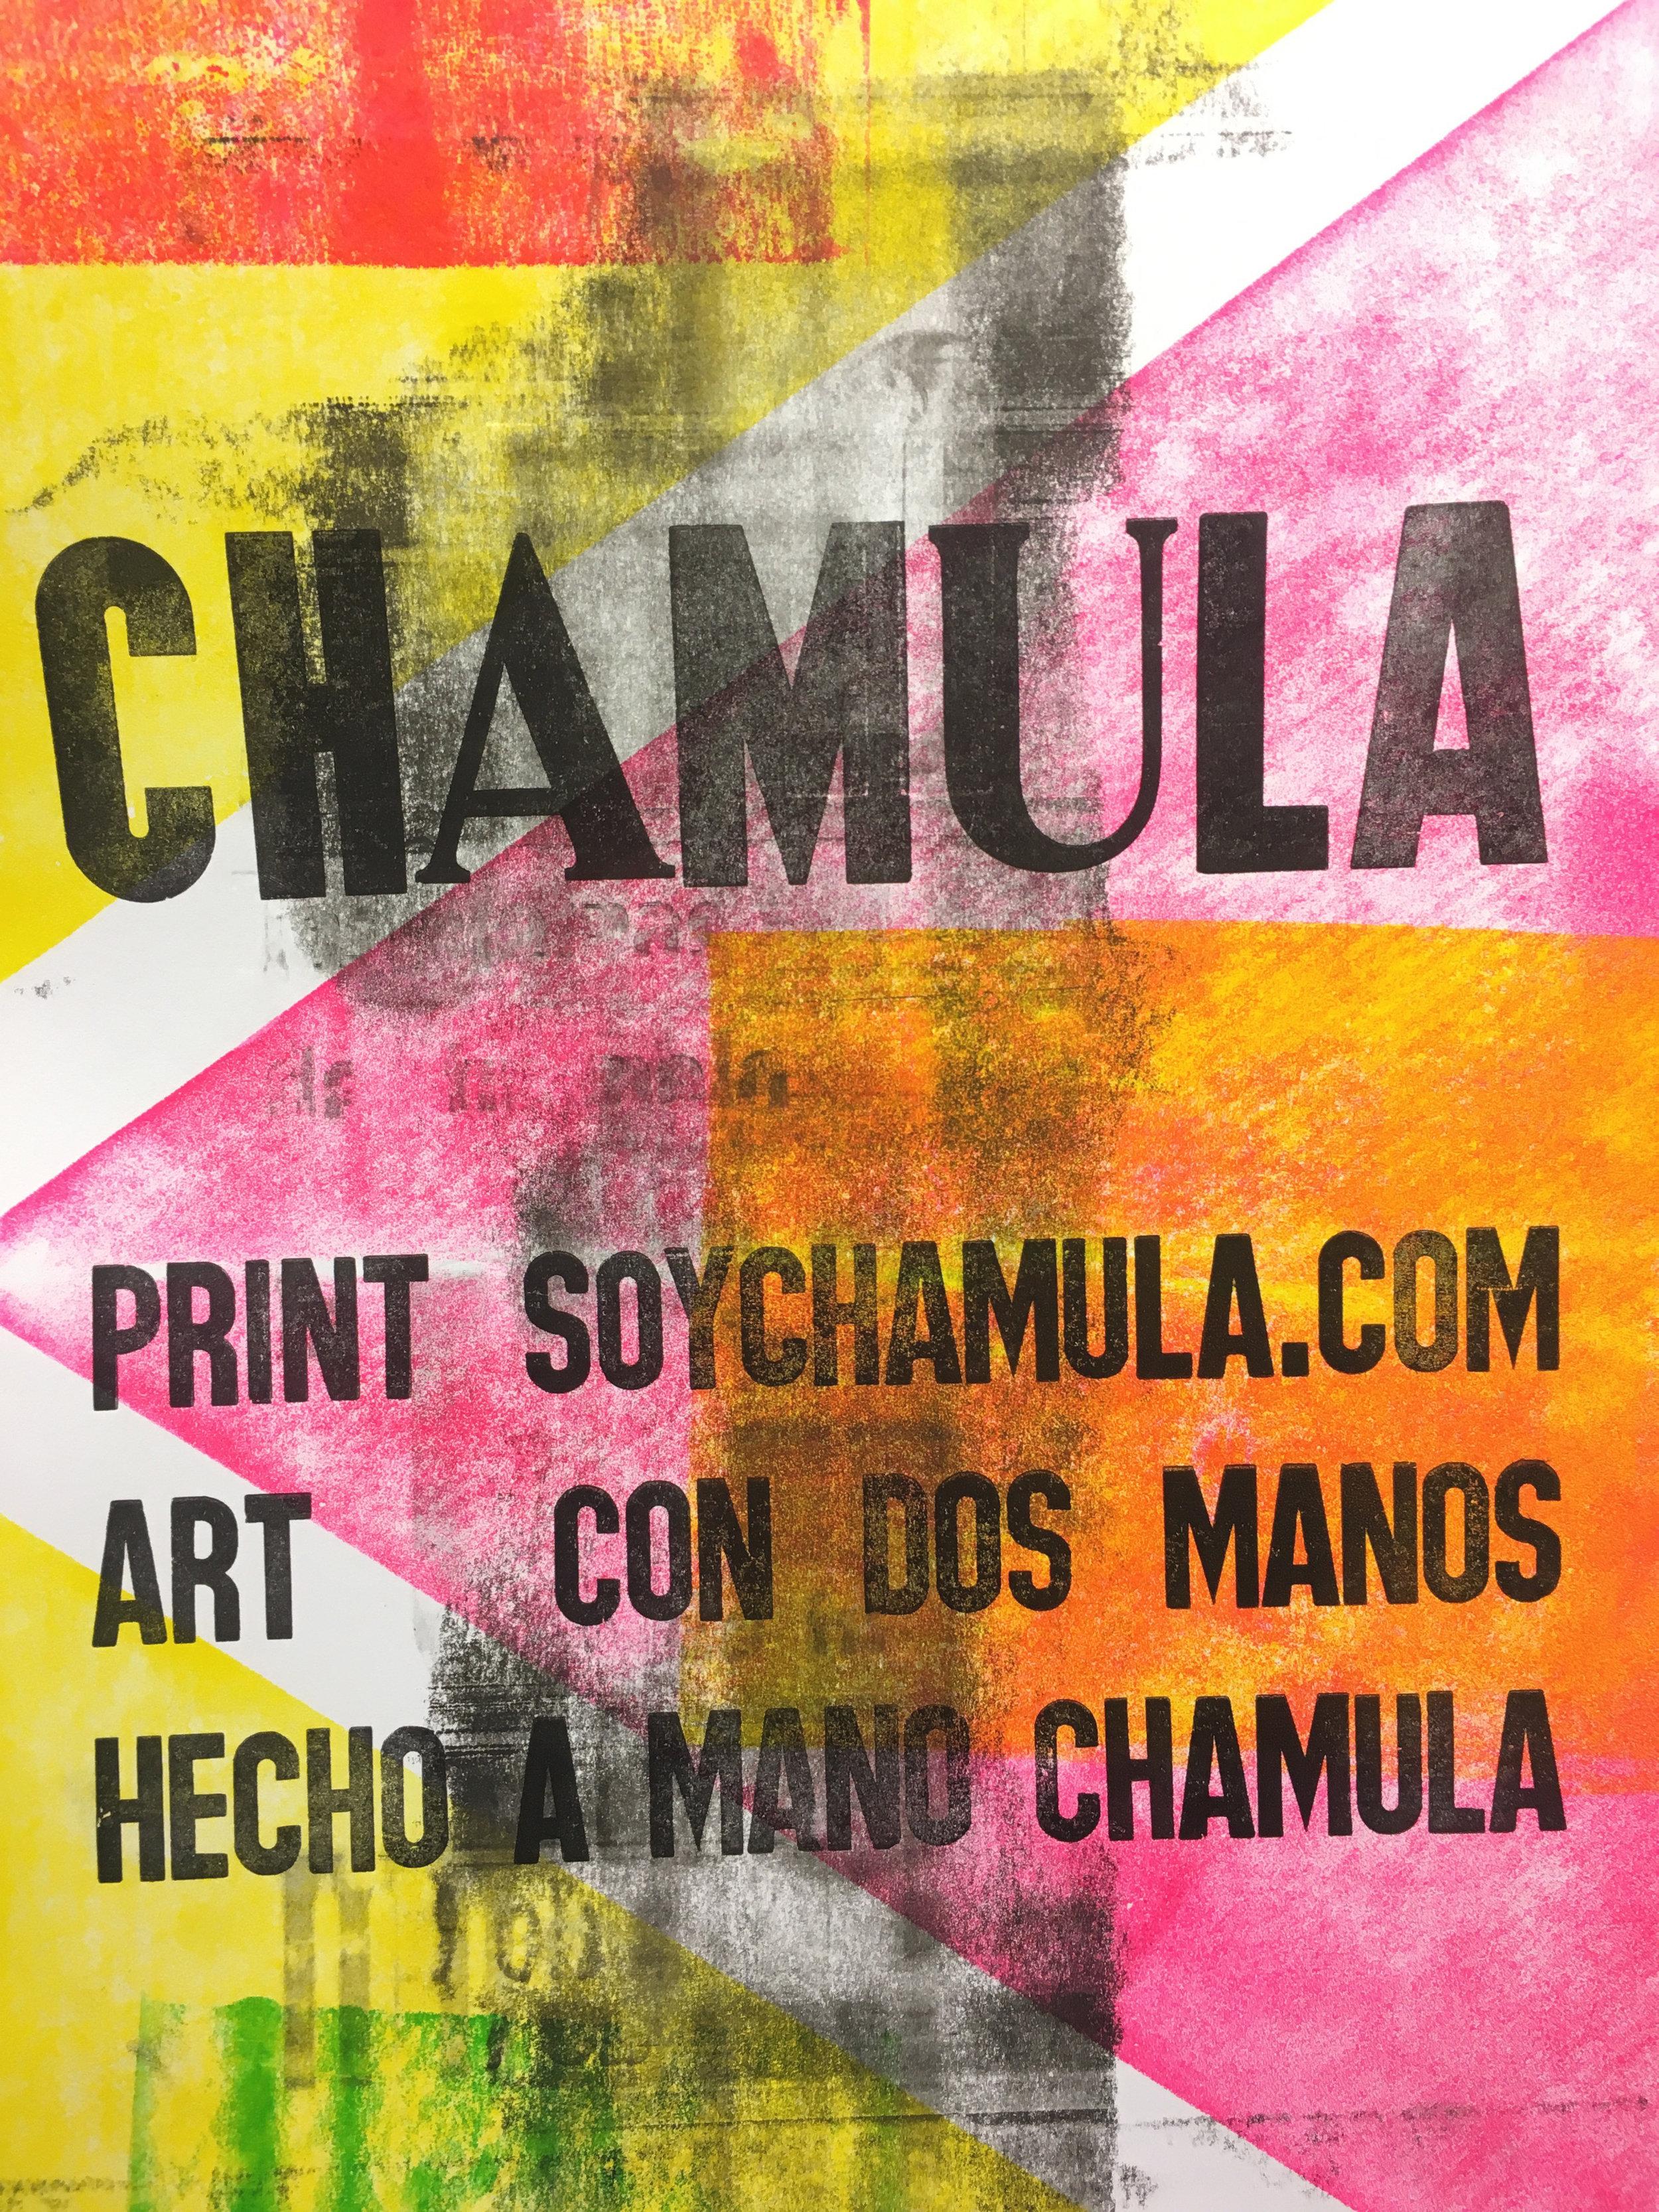 personalpress-taller-papel-principal-letterpress-imprenta-tipografica-1.jpg